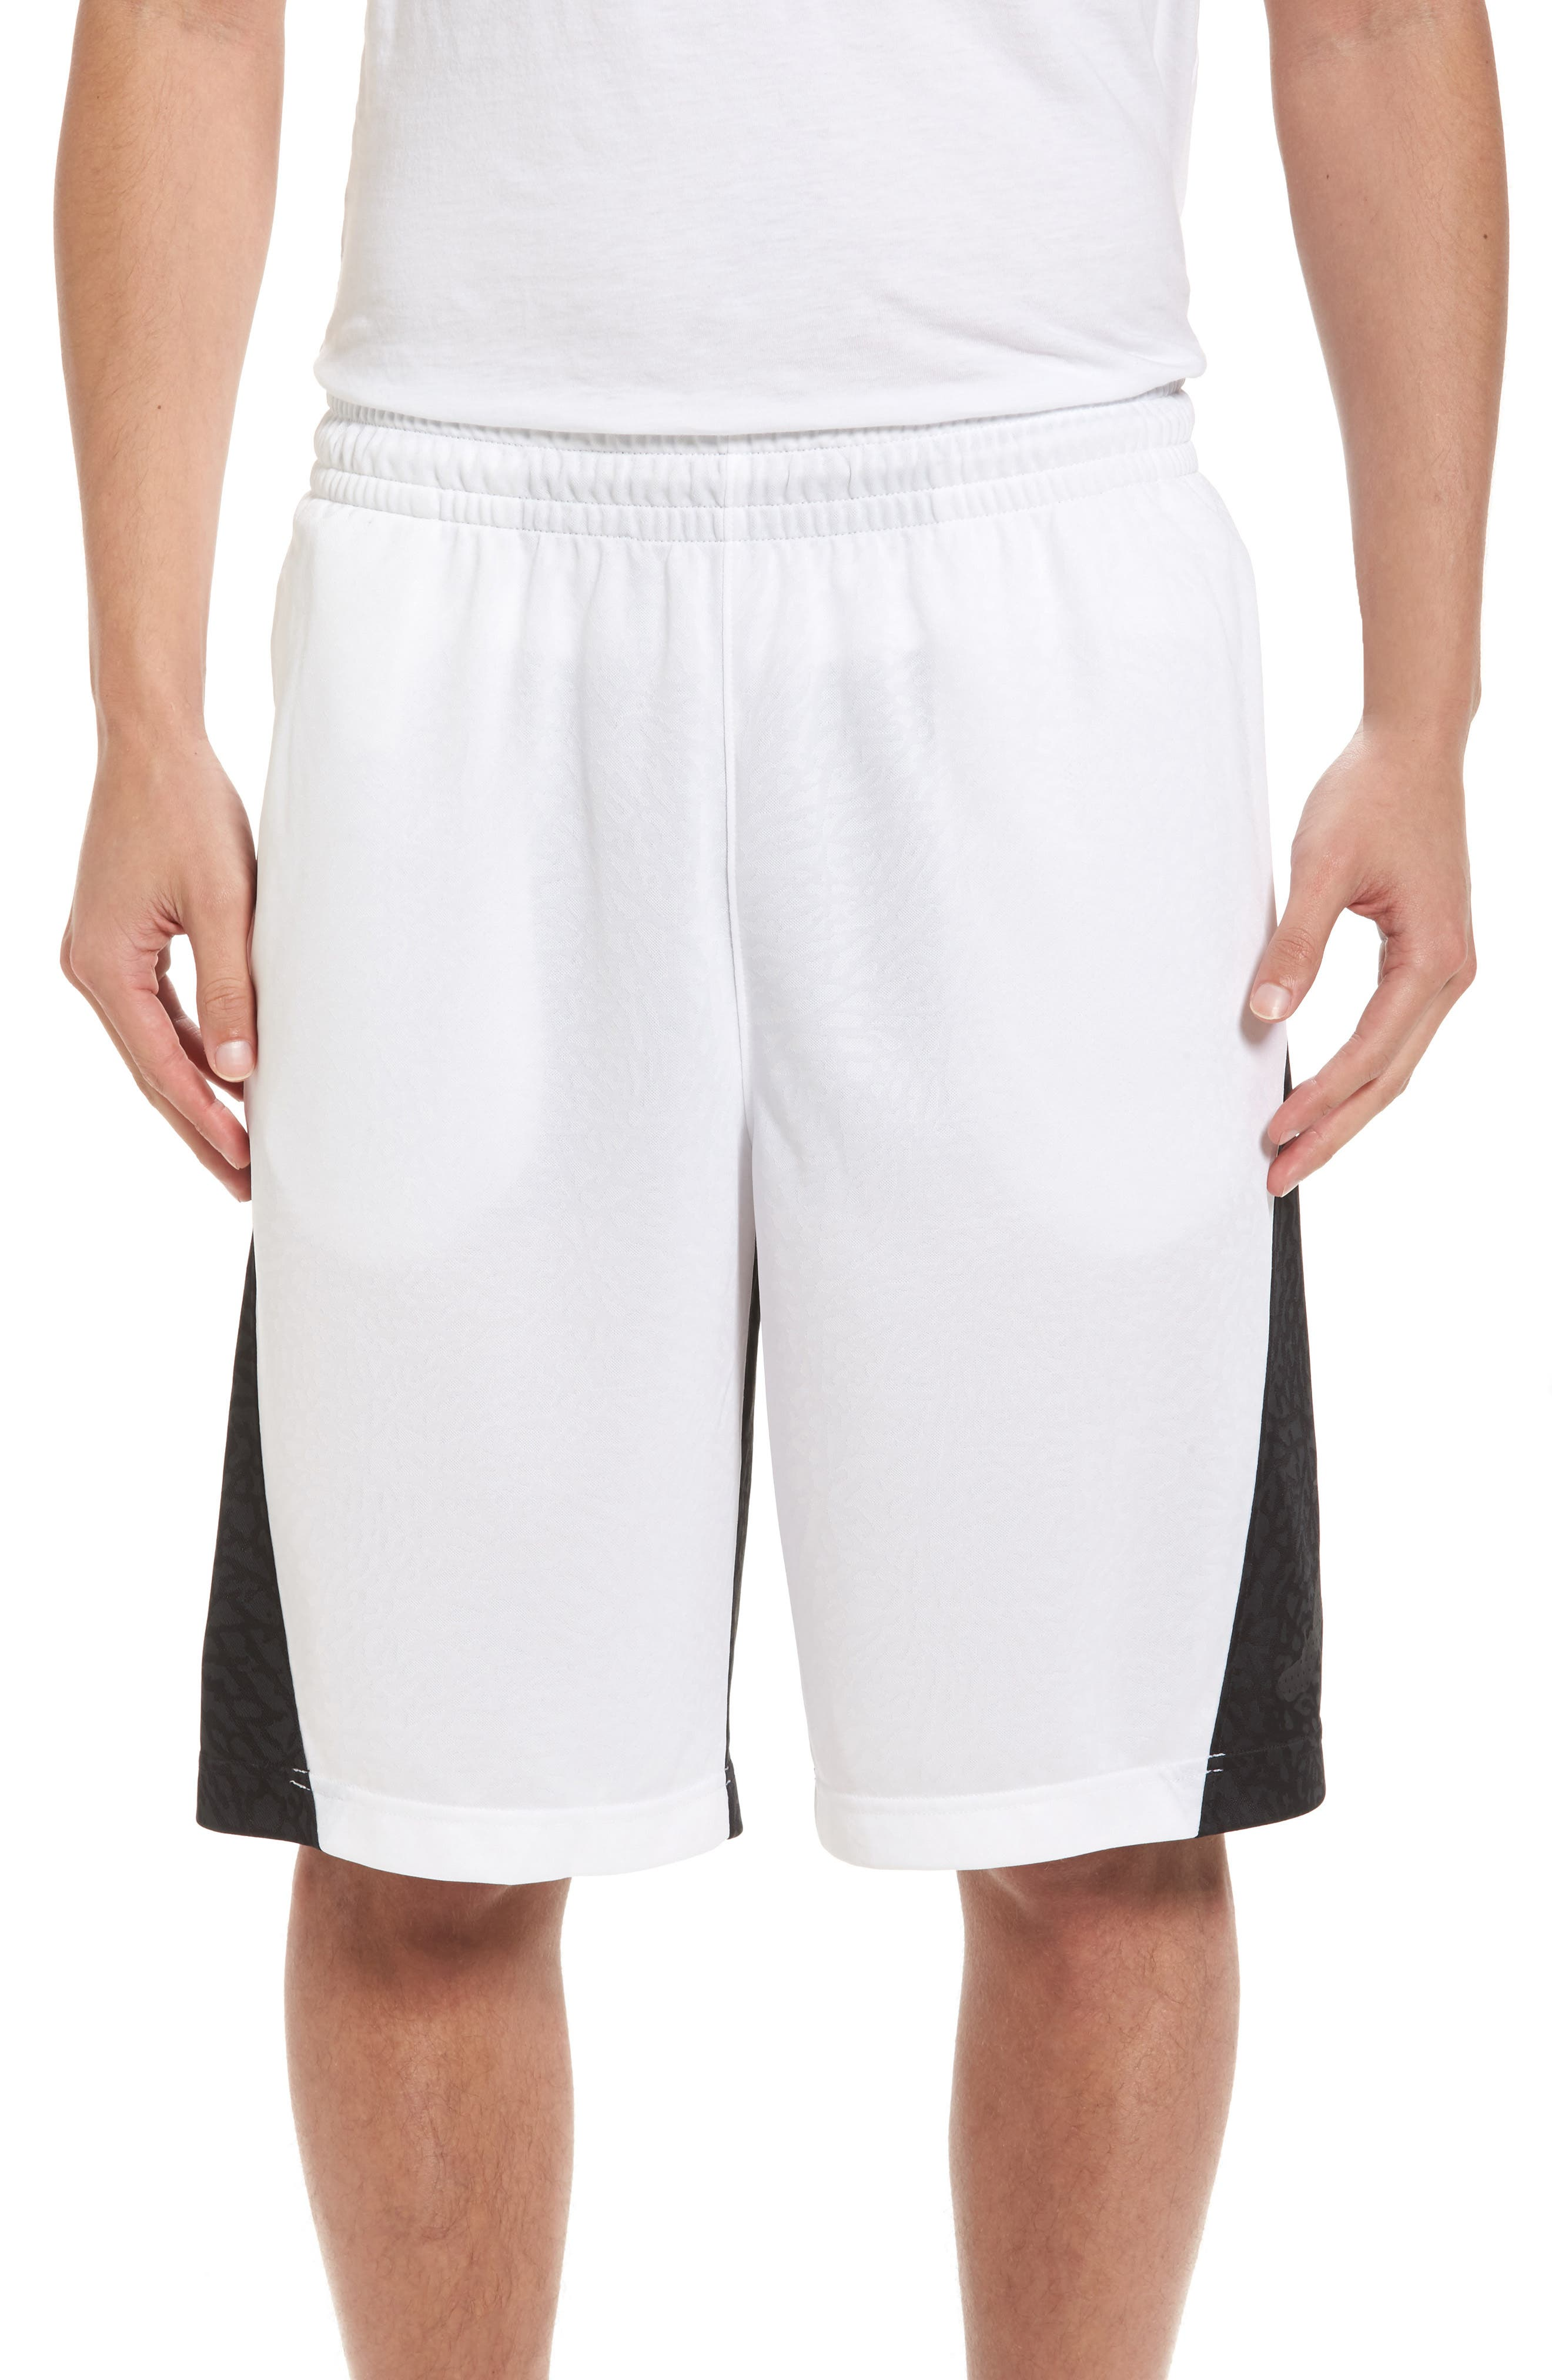 Rise Vertical Basketball Shorts,                         Main,                         color, White/ Black/ Black